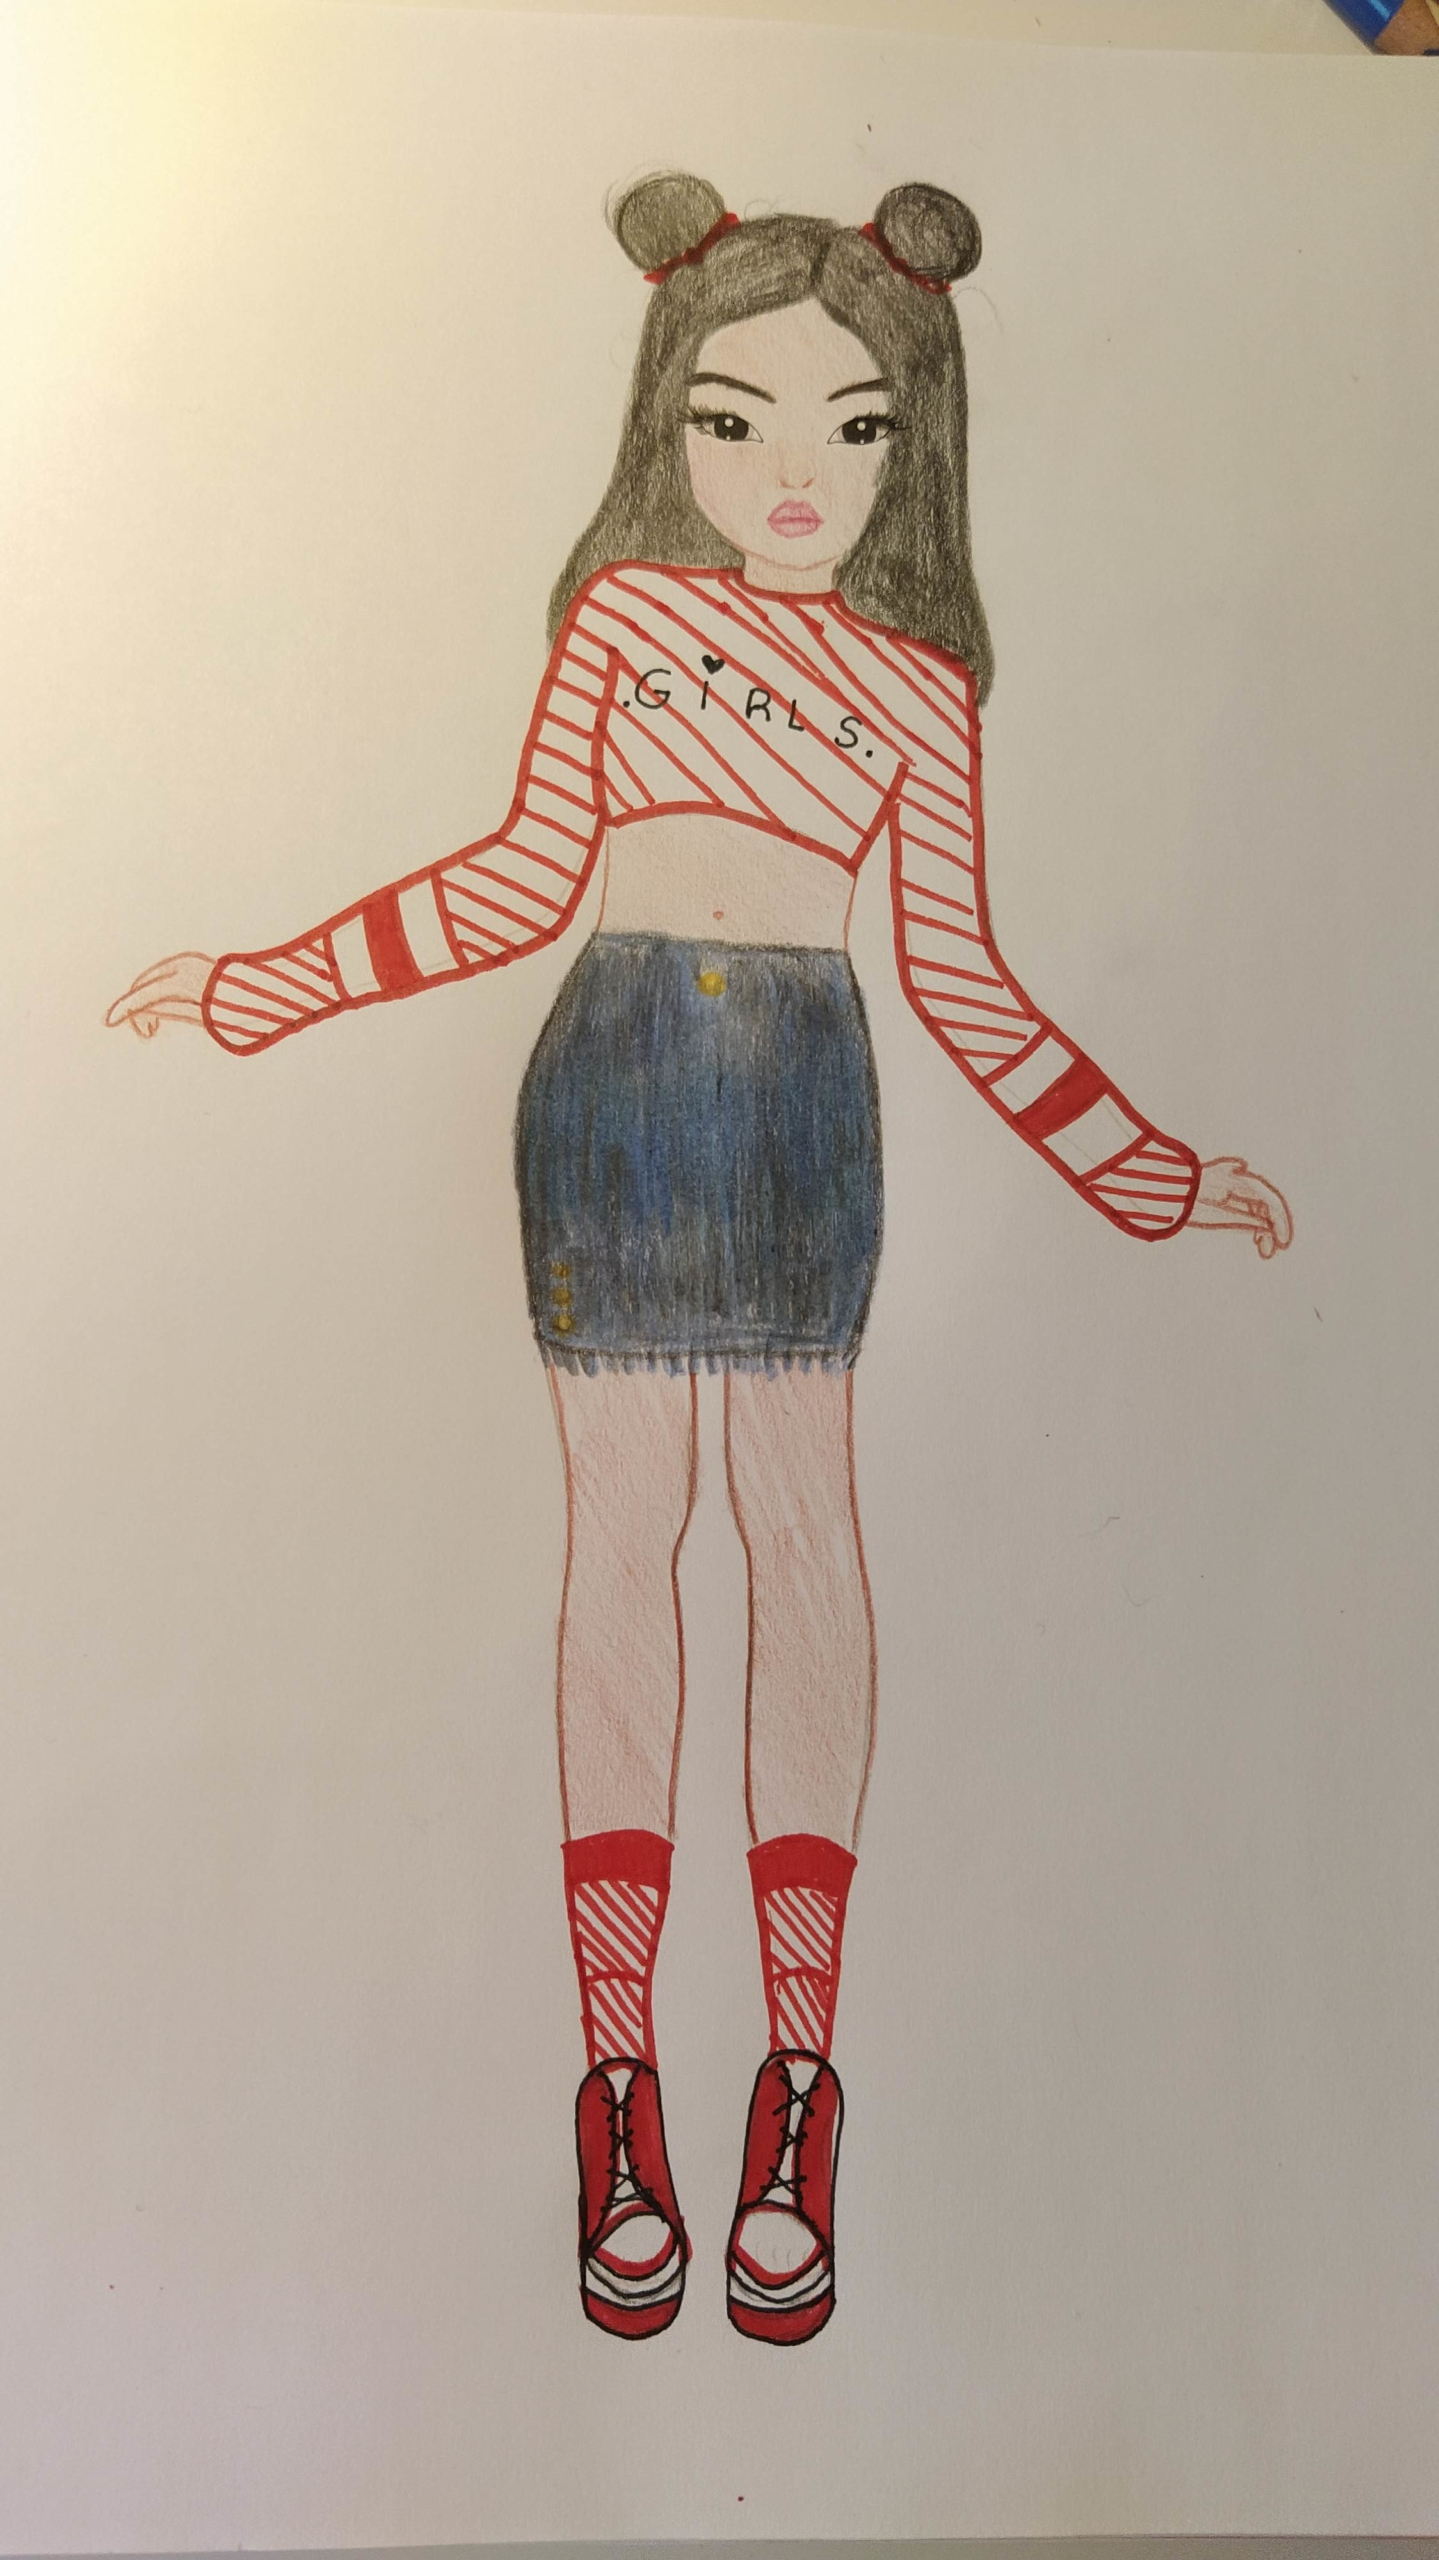 Marta S., 11 Jahre, aus Estepona